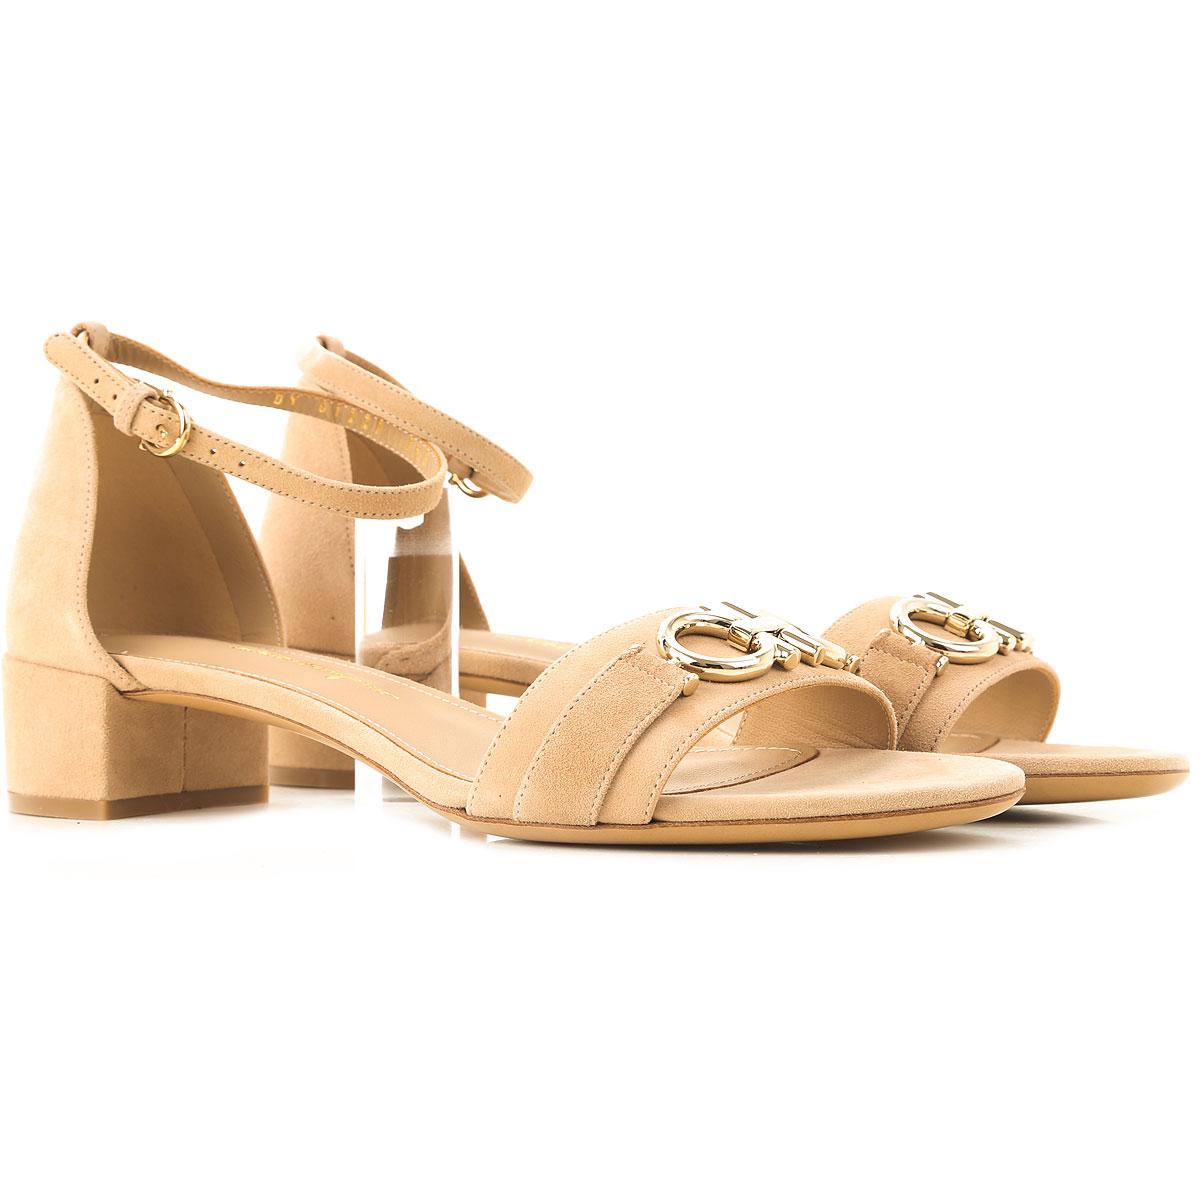 Salvatore Ferragamo Sandals for Women, Almond, Suede leather, 2019, 5.5 6.5 7 8 8.5